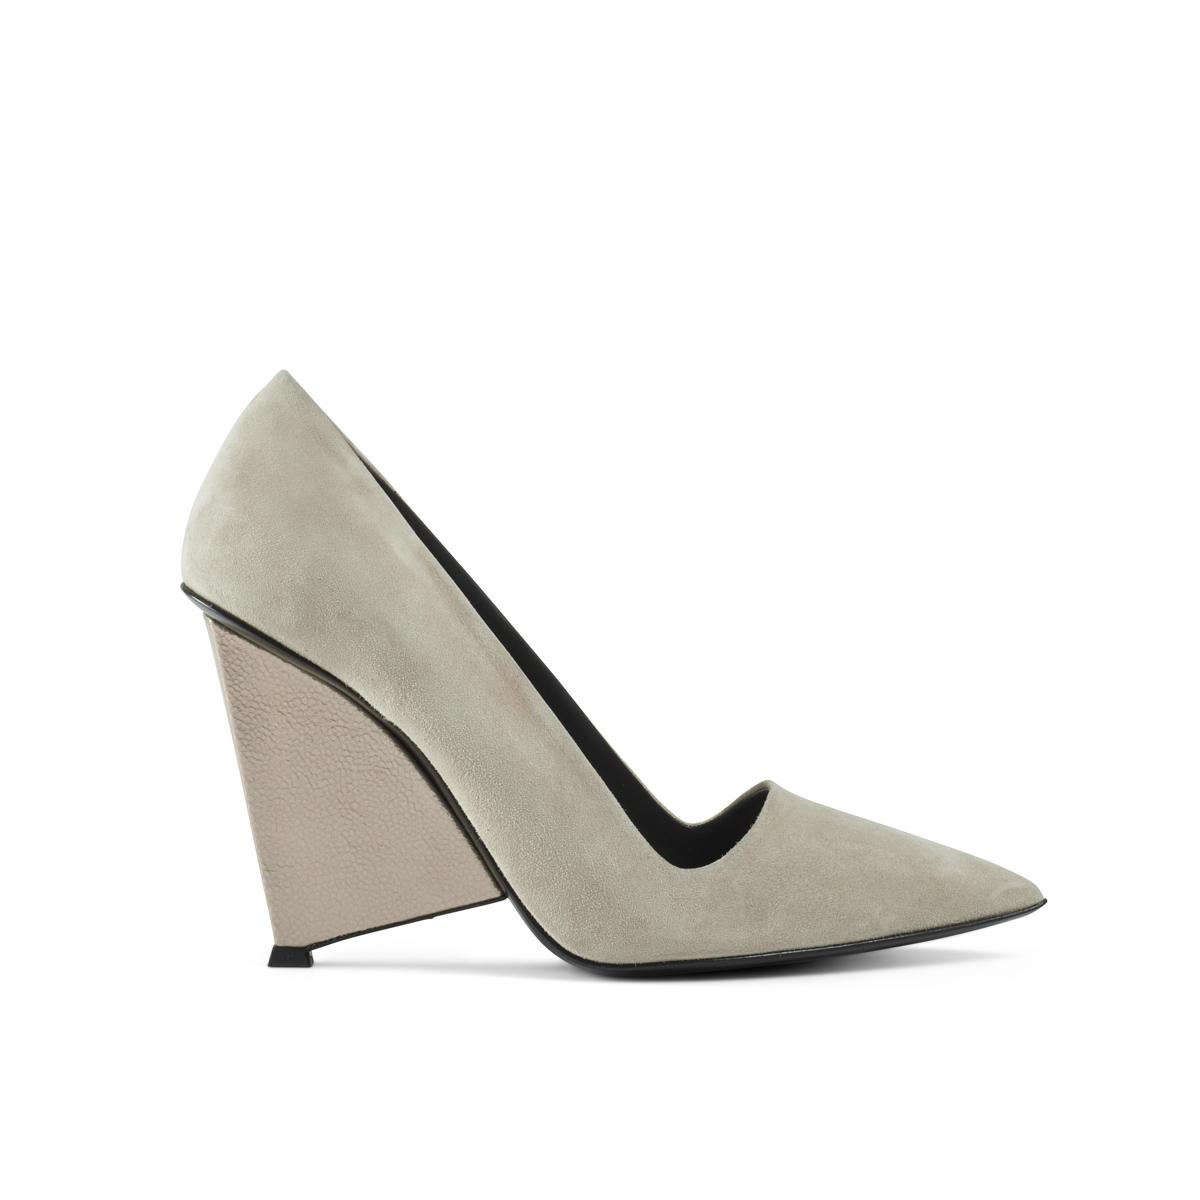 023_alaintondowski_springsummer2017_shoes_3070